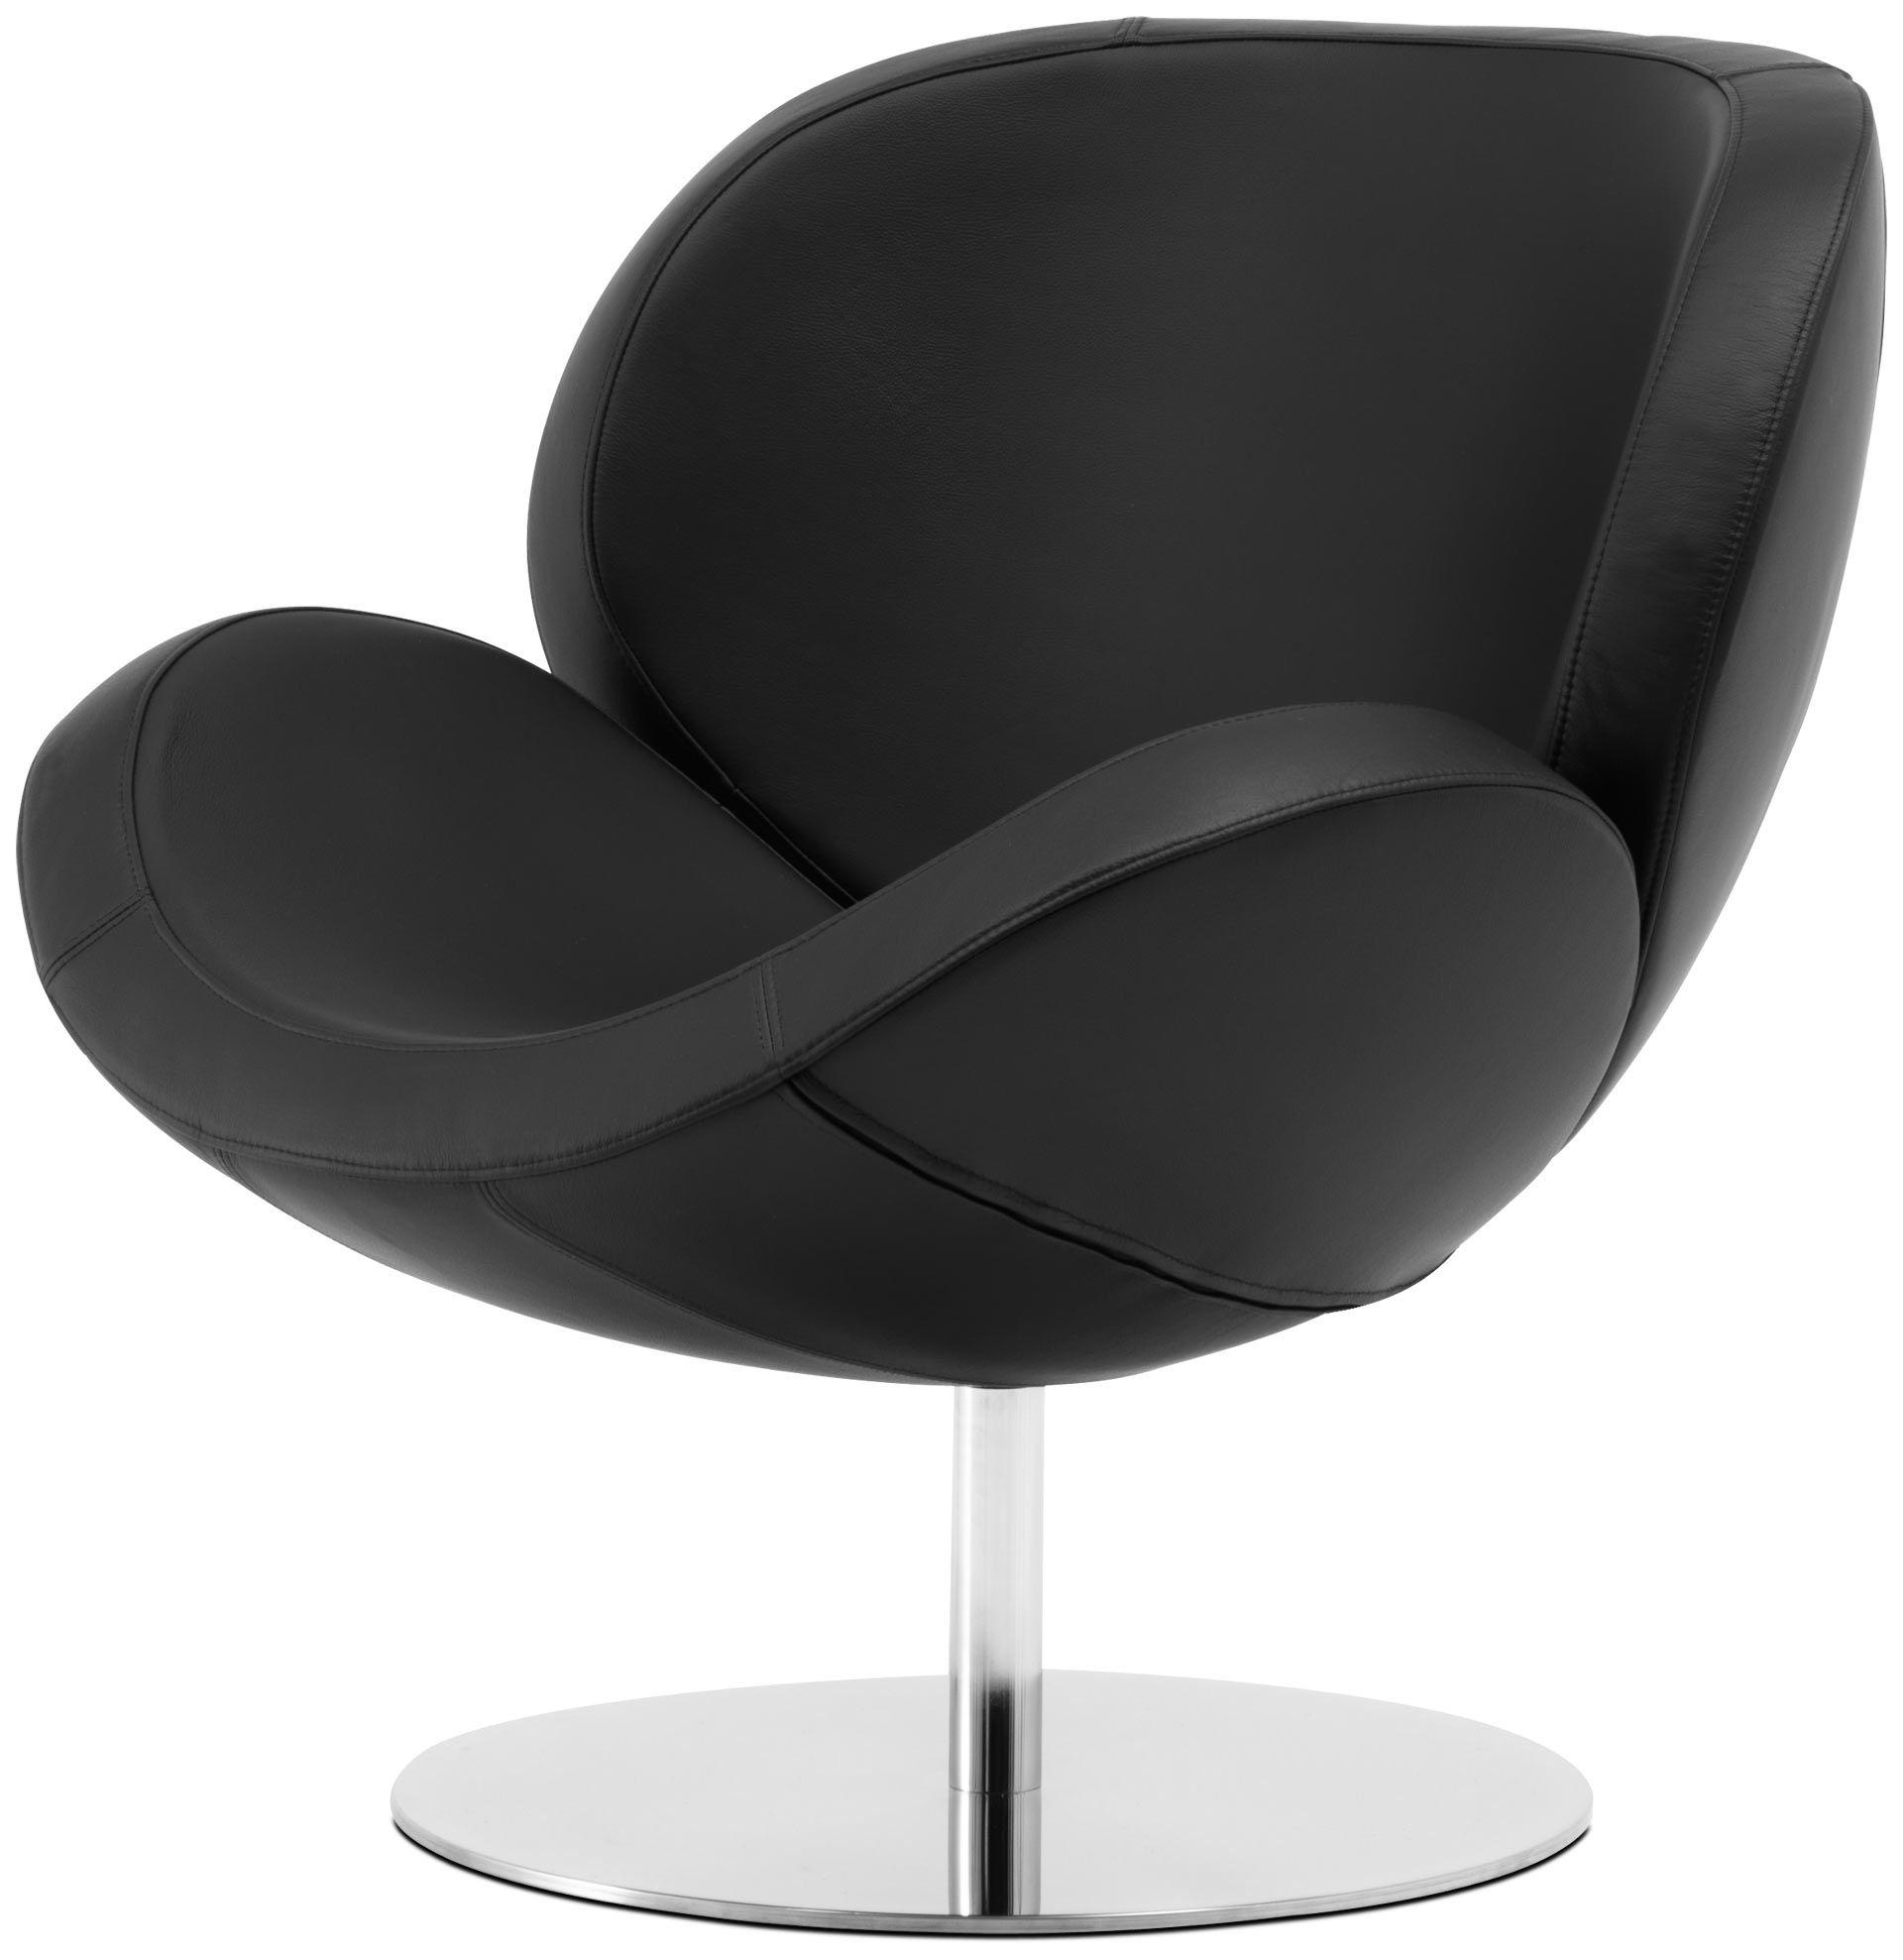 Fauteuil Schelly - Boconcept | Modern Armchair, Contemporary ... à Bo Concept Fauteuil